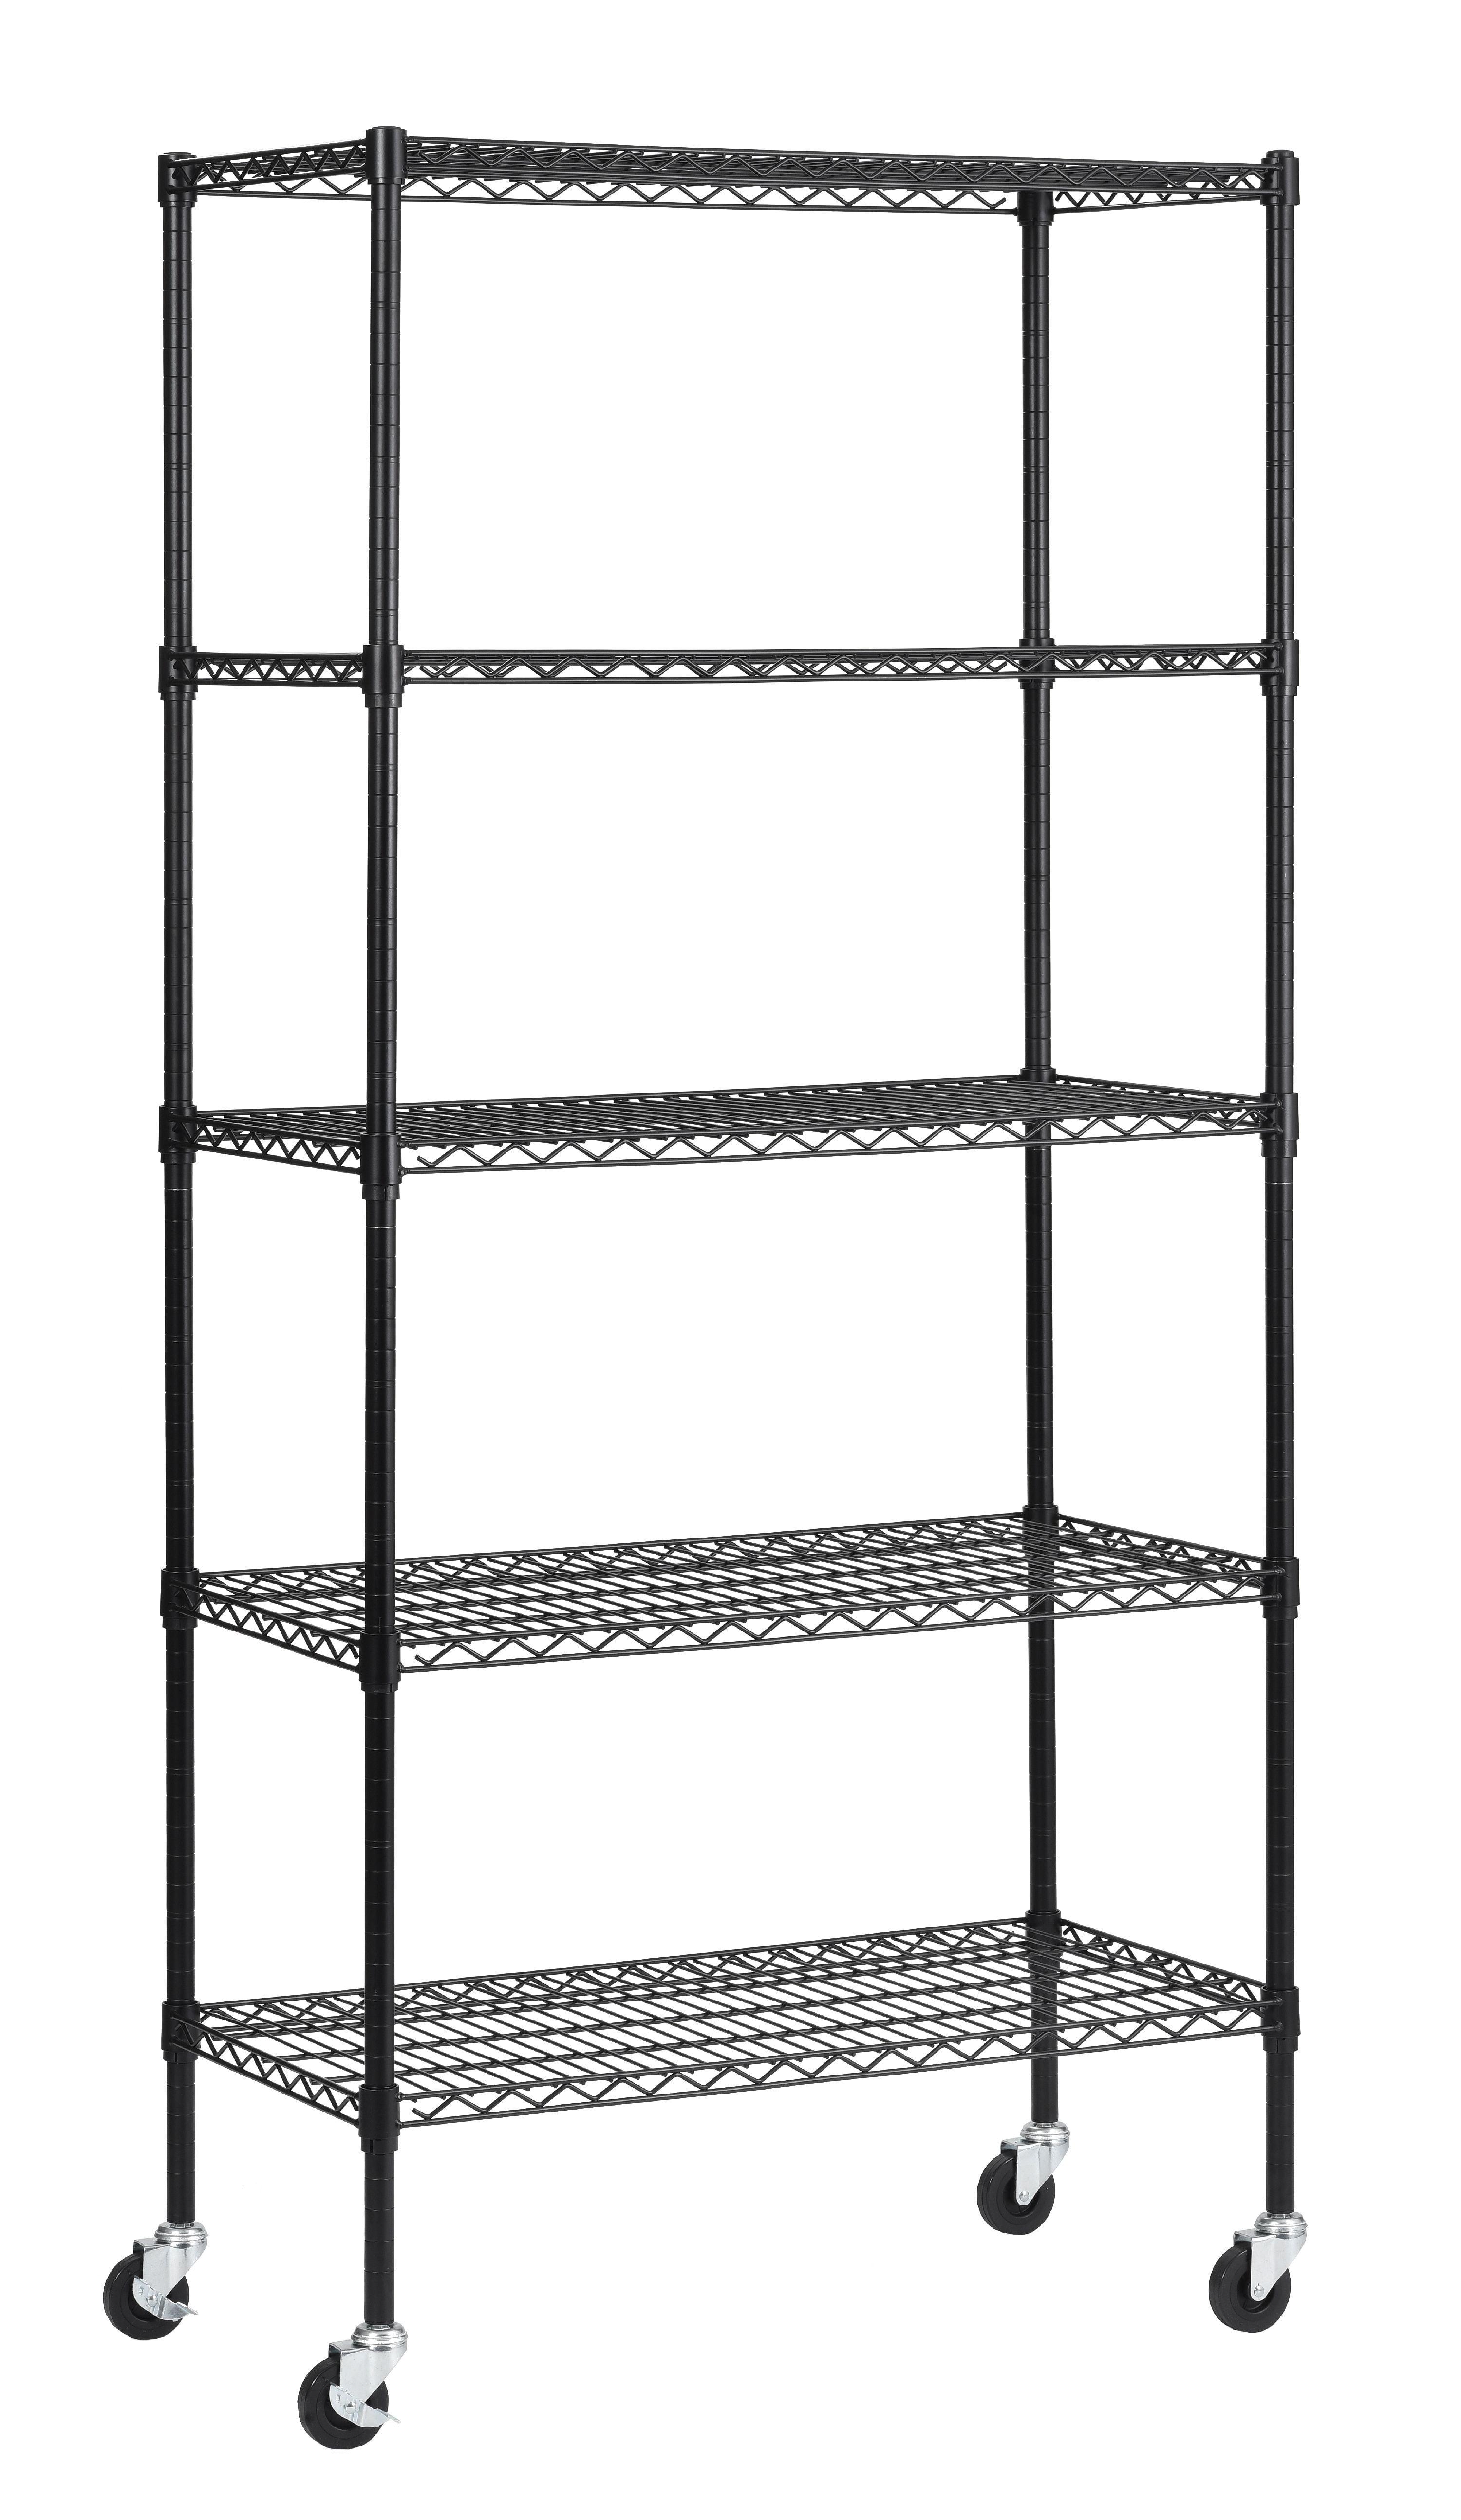 "New 5 Tier Wire Shelving Unit NSF Metal Shelf Rack 800 LBS Capacity 24""x18""x72"""